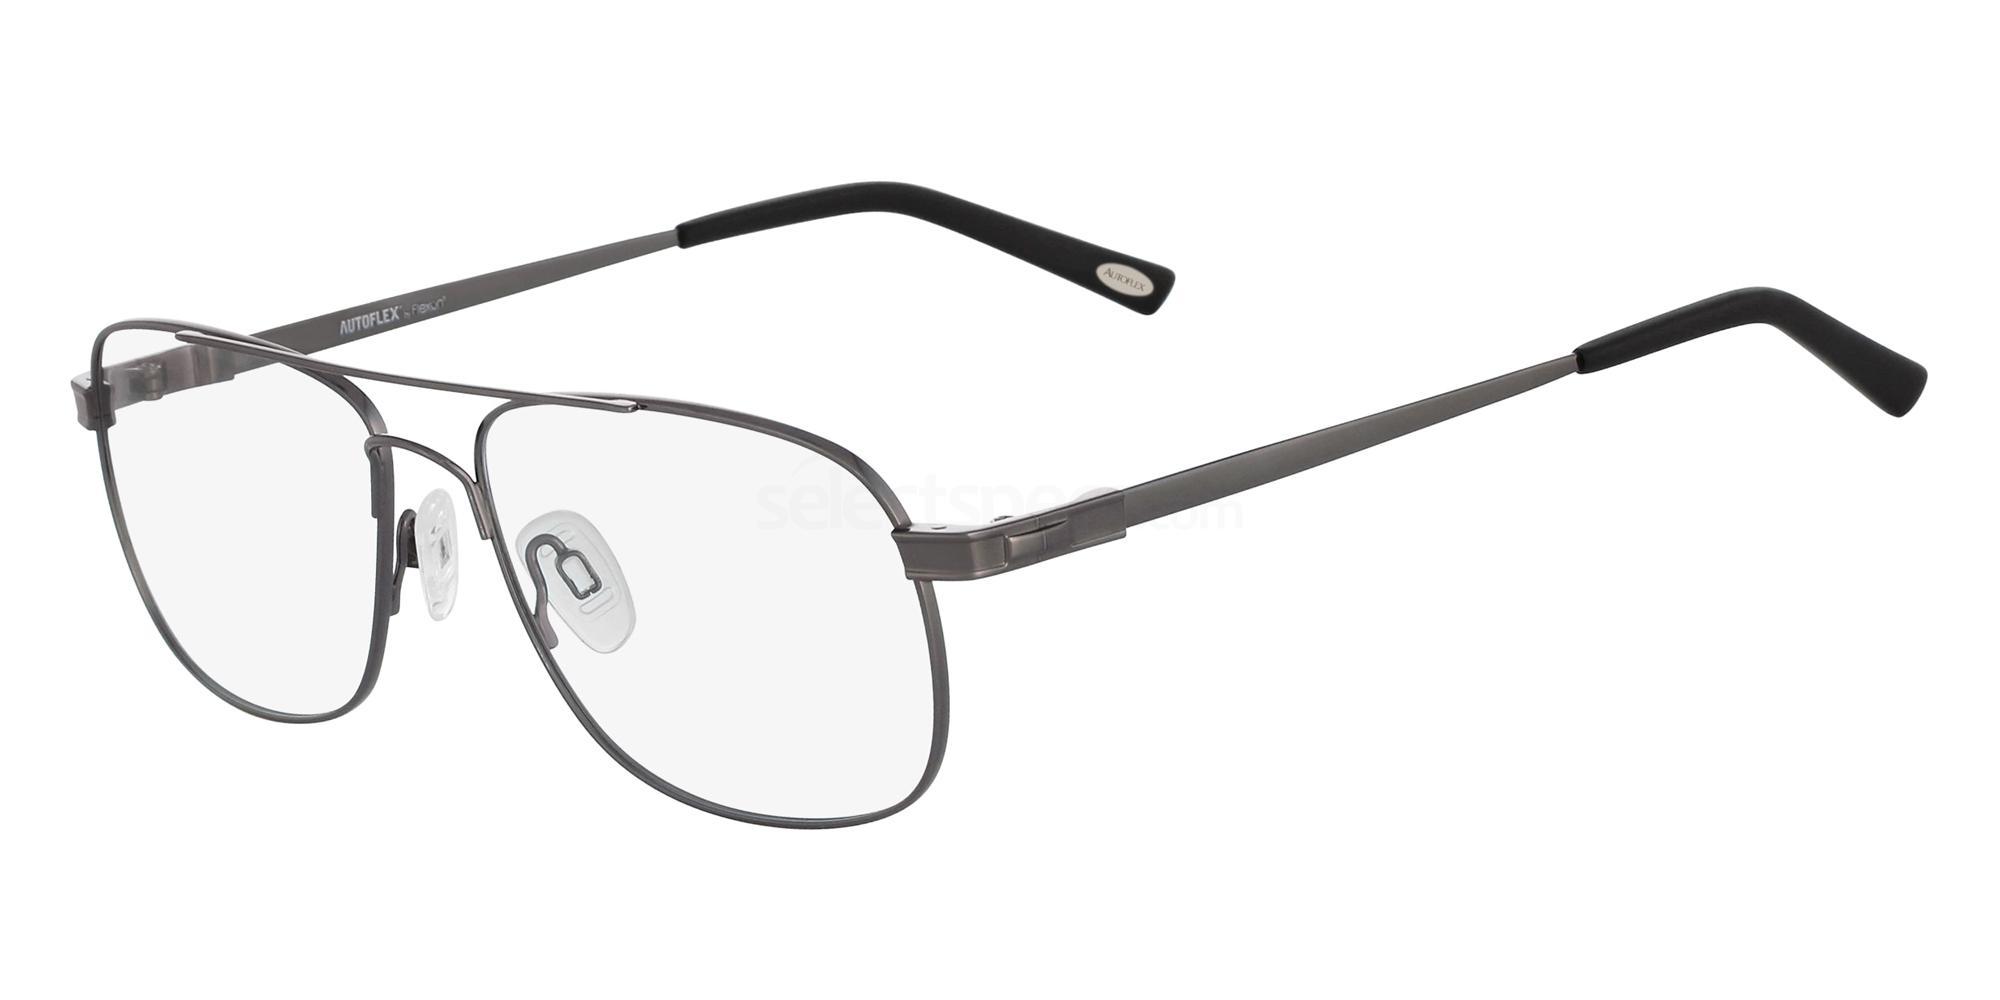 033 AUTOFLEX DESPERADO Glasses, Flexon